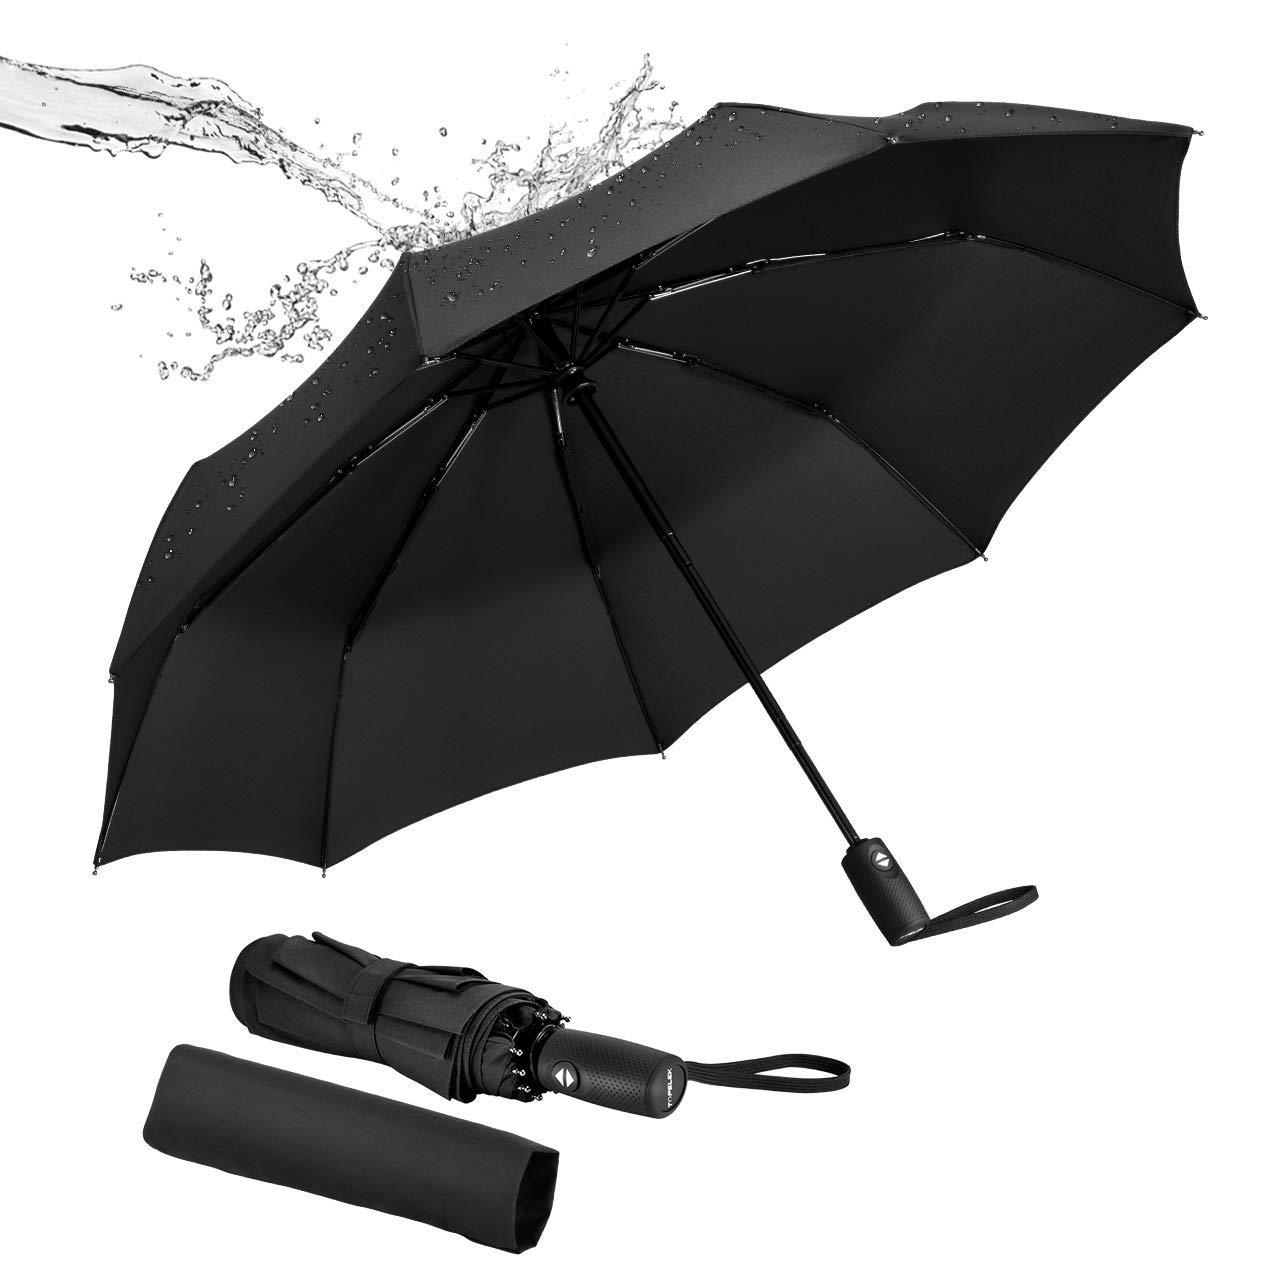 TOPELEK Windproof Umbrella, Sturdy [9 Ribs], Auto Open and Close